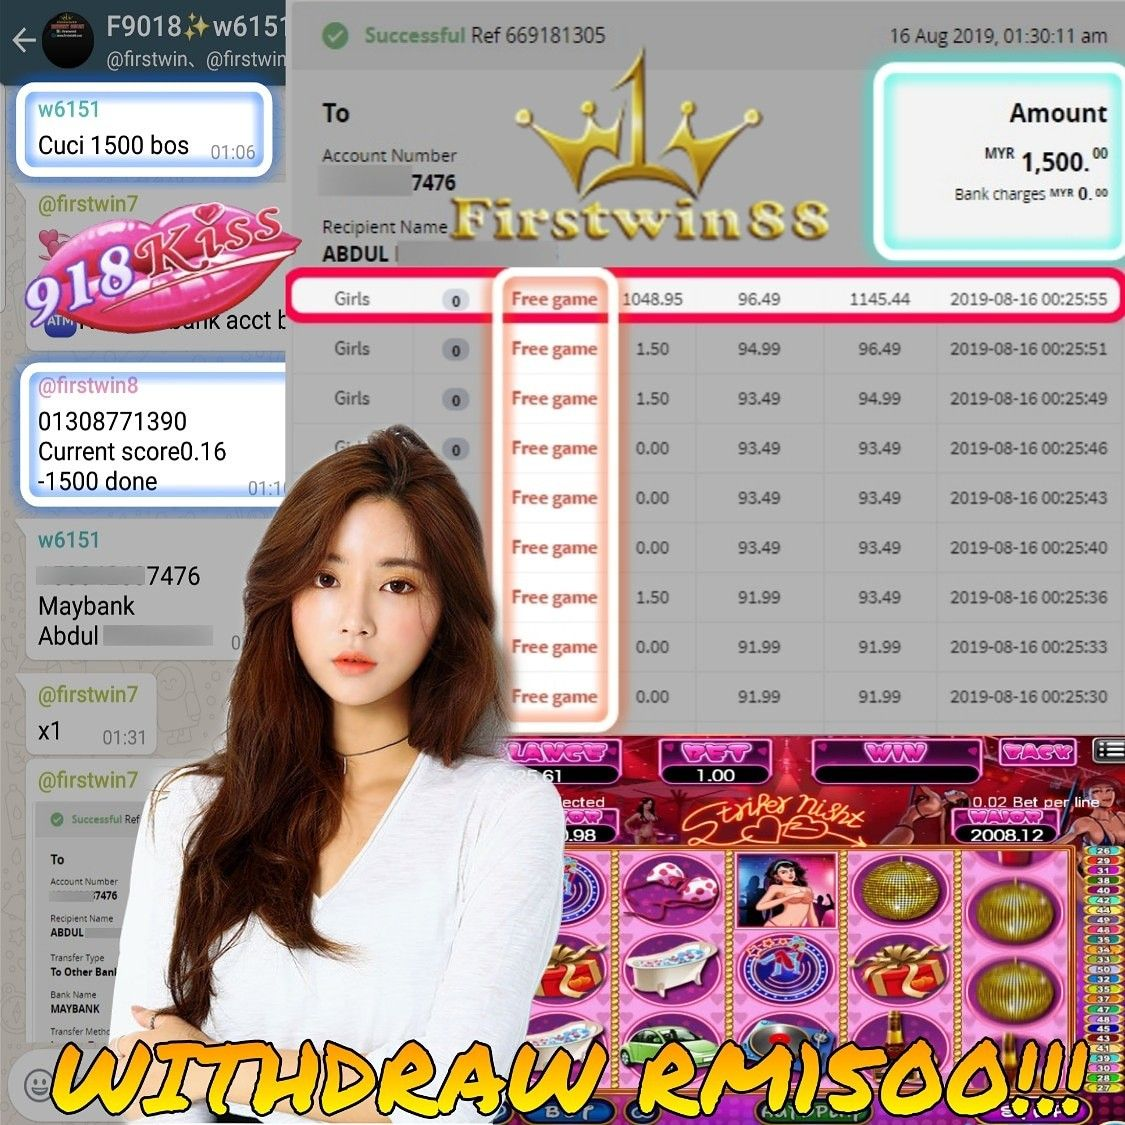 Congratulations to #Firstwin88 #918Kiss MemberF9018 SlotGame #Girls Won PriceRM1500 #GameBonus explore Pinterest